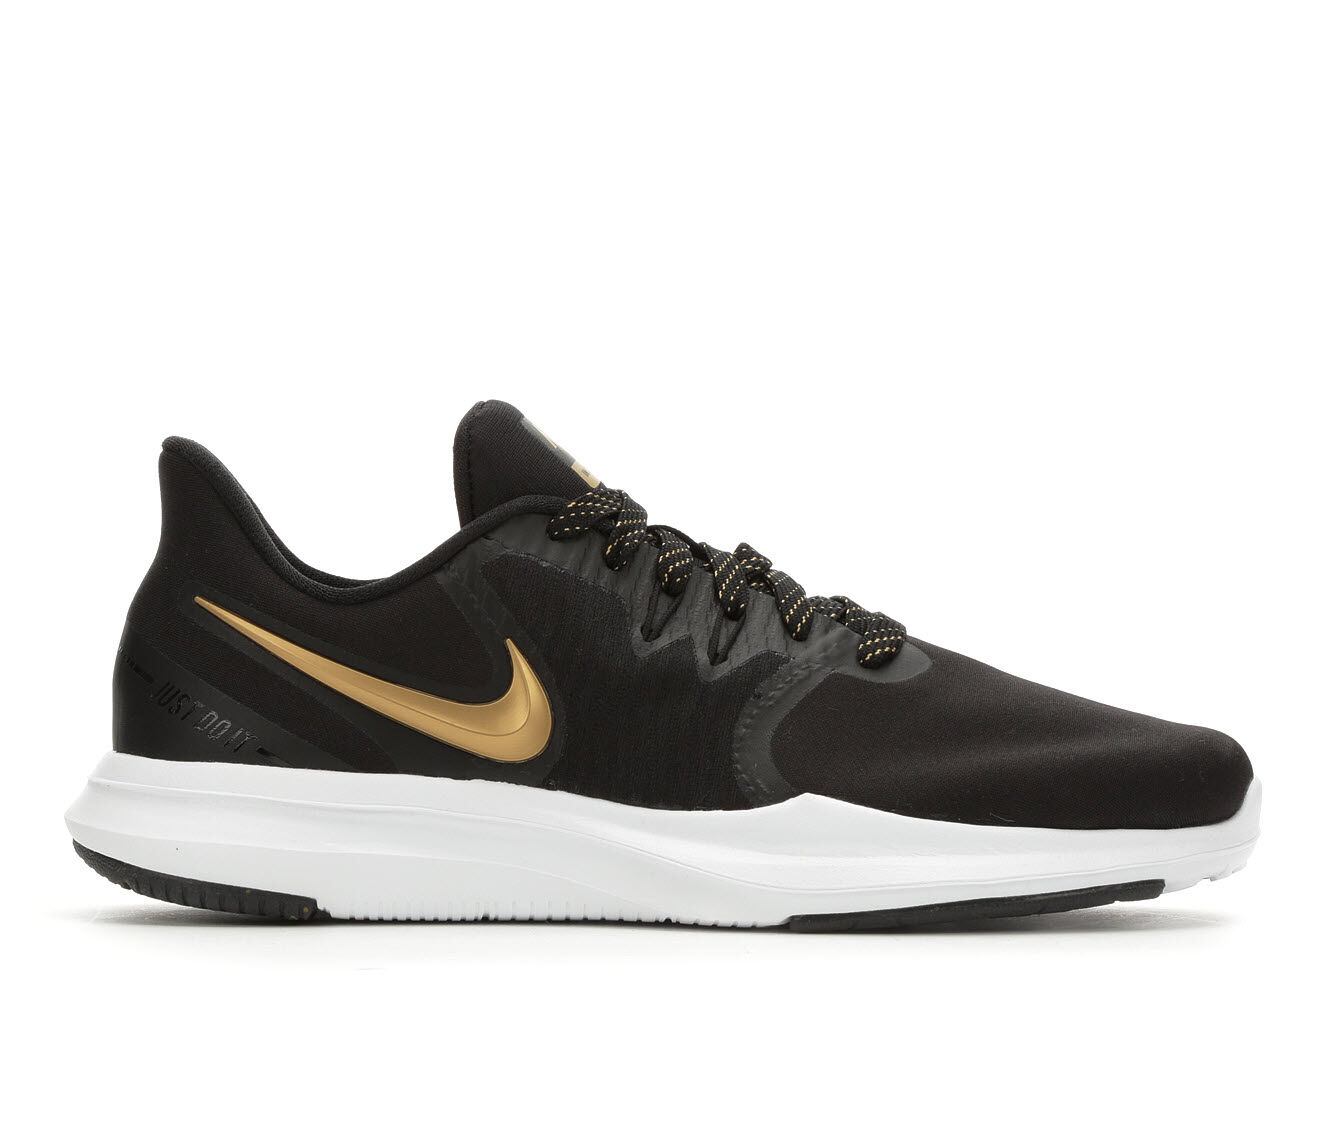 Women's Nike In-Season TR 8 Training Shoes Black/Gold/Wht